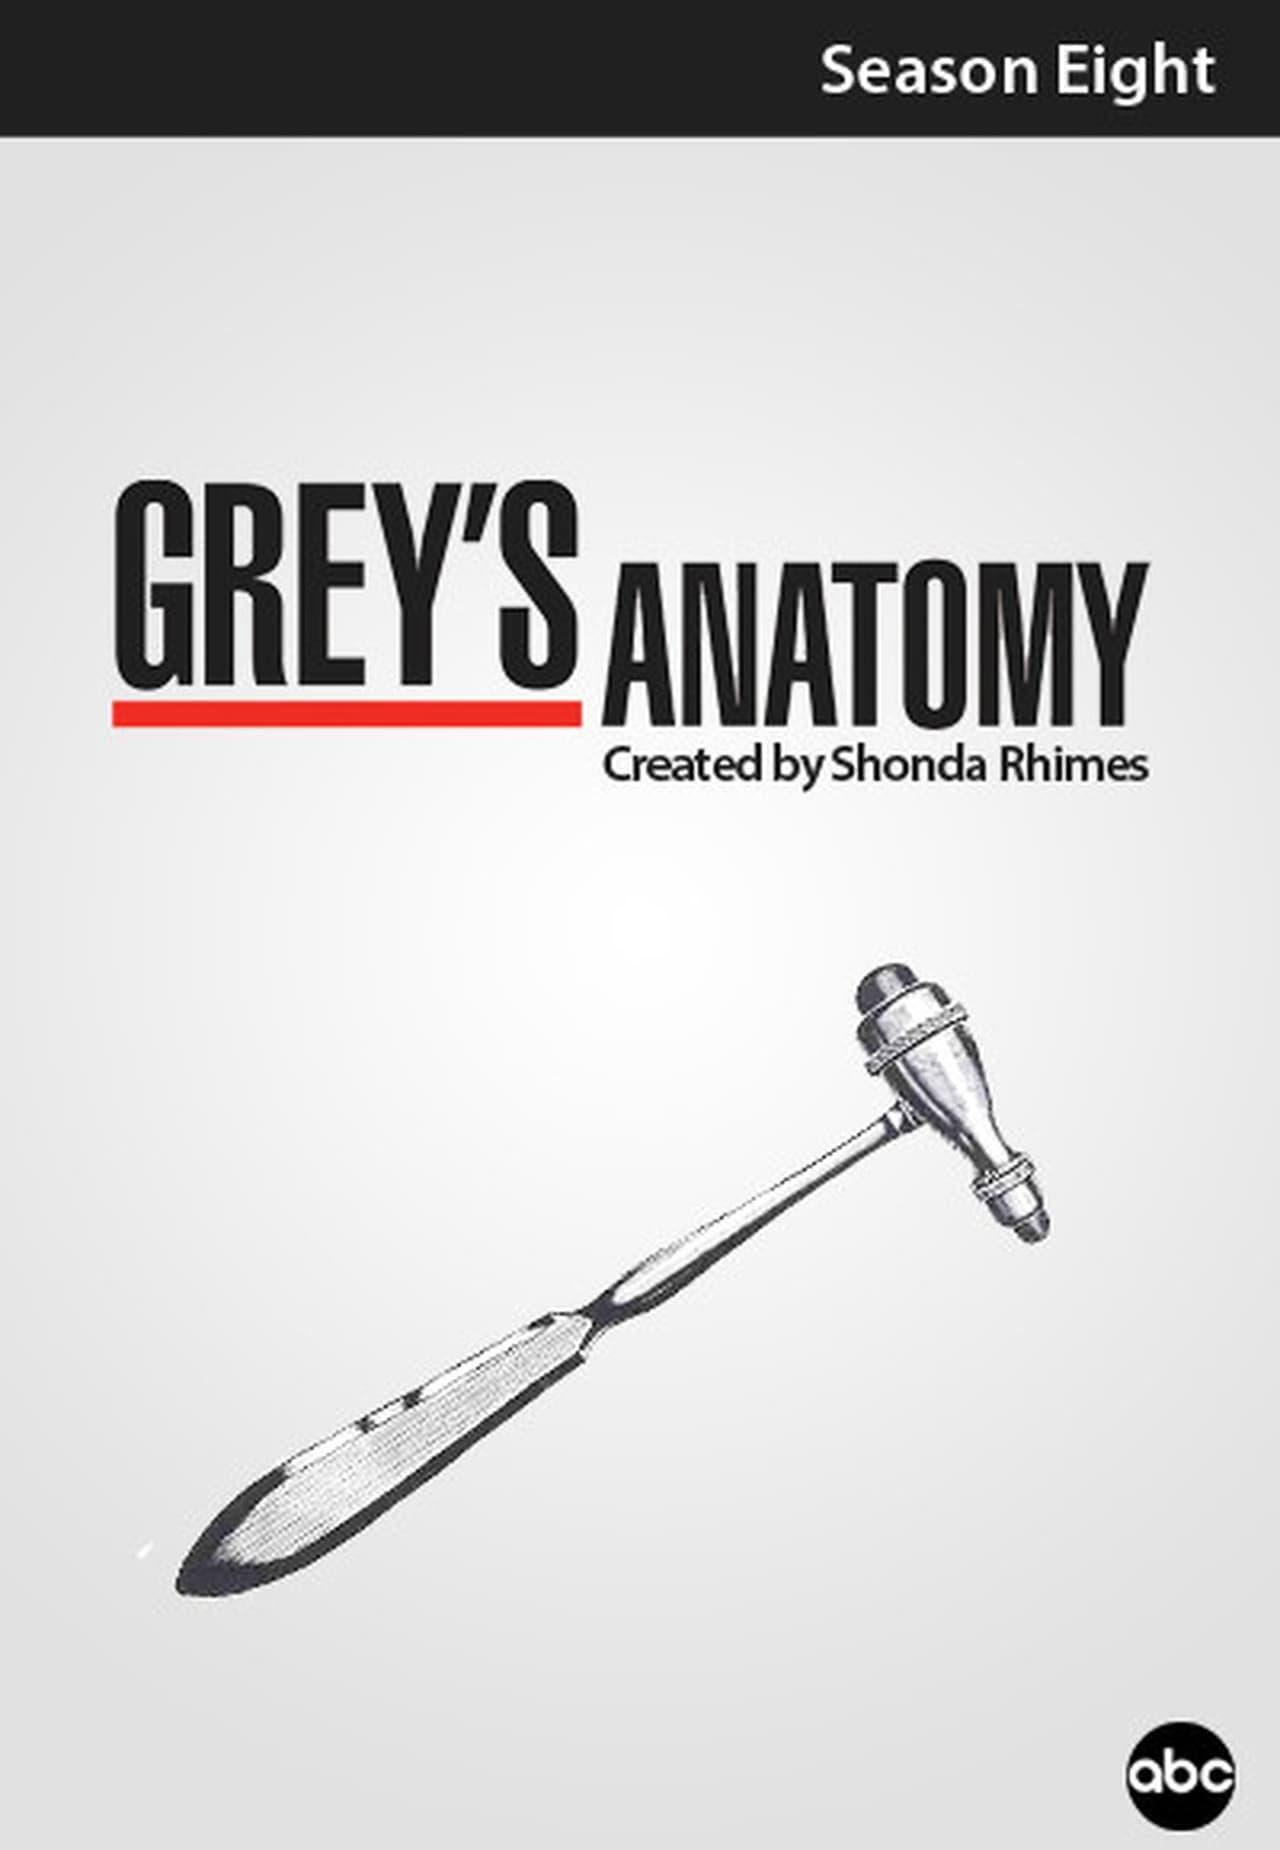 Grey's Anatomy Season 8 (2011) putlockers cafe